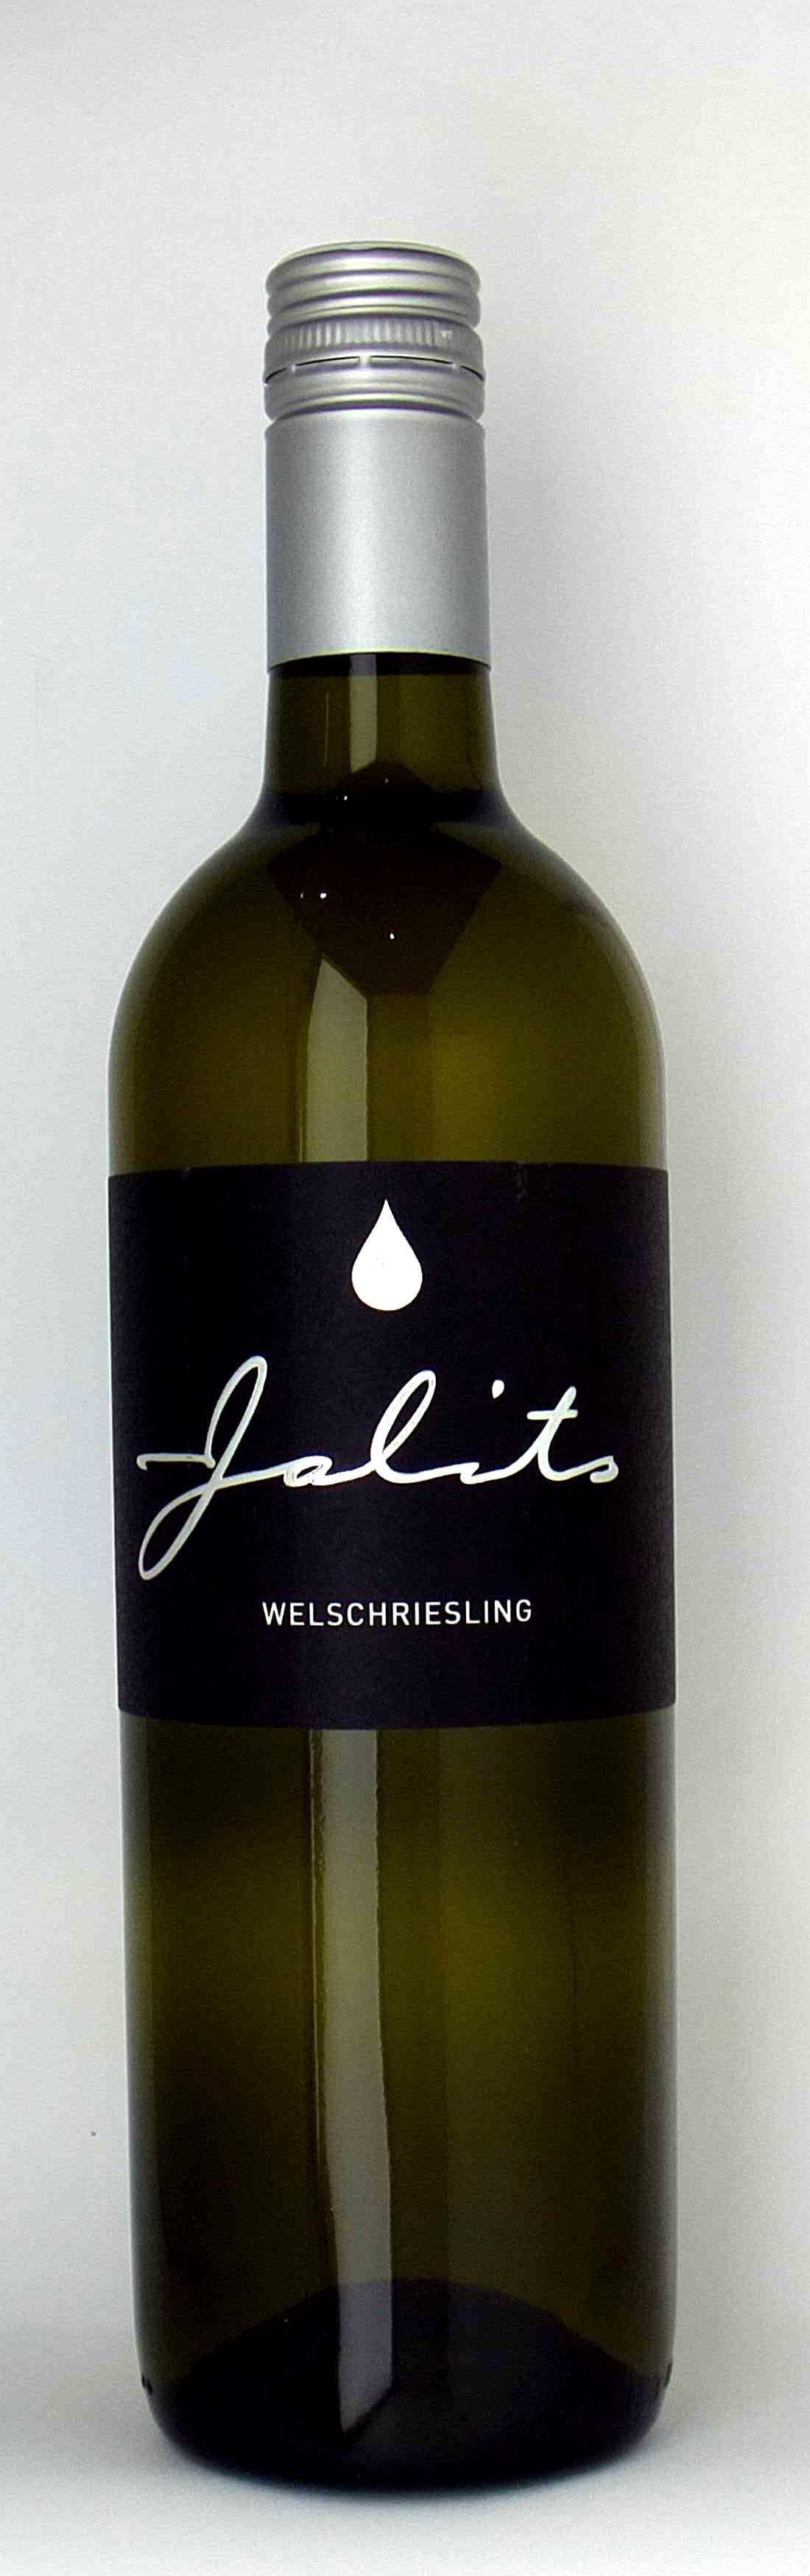 Vinothek Eisenberg Welschriesling 2019 Jalits